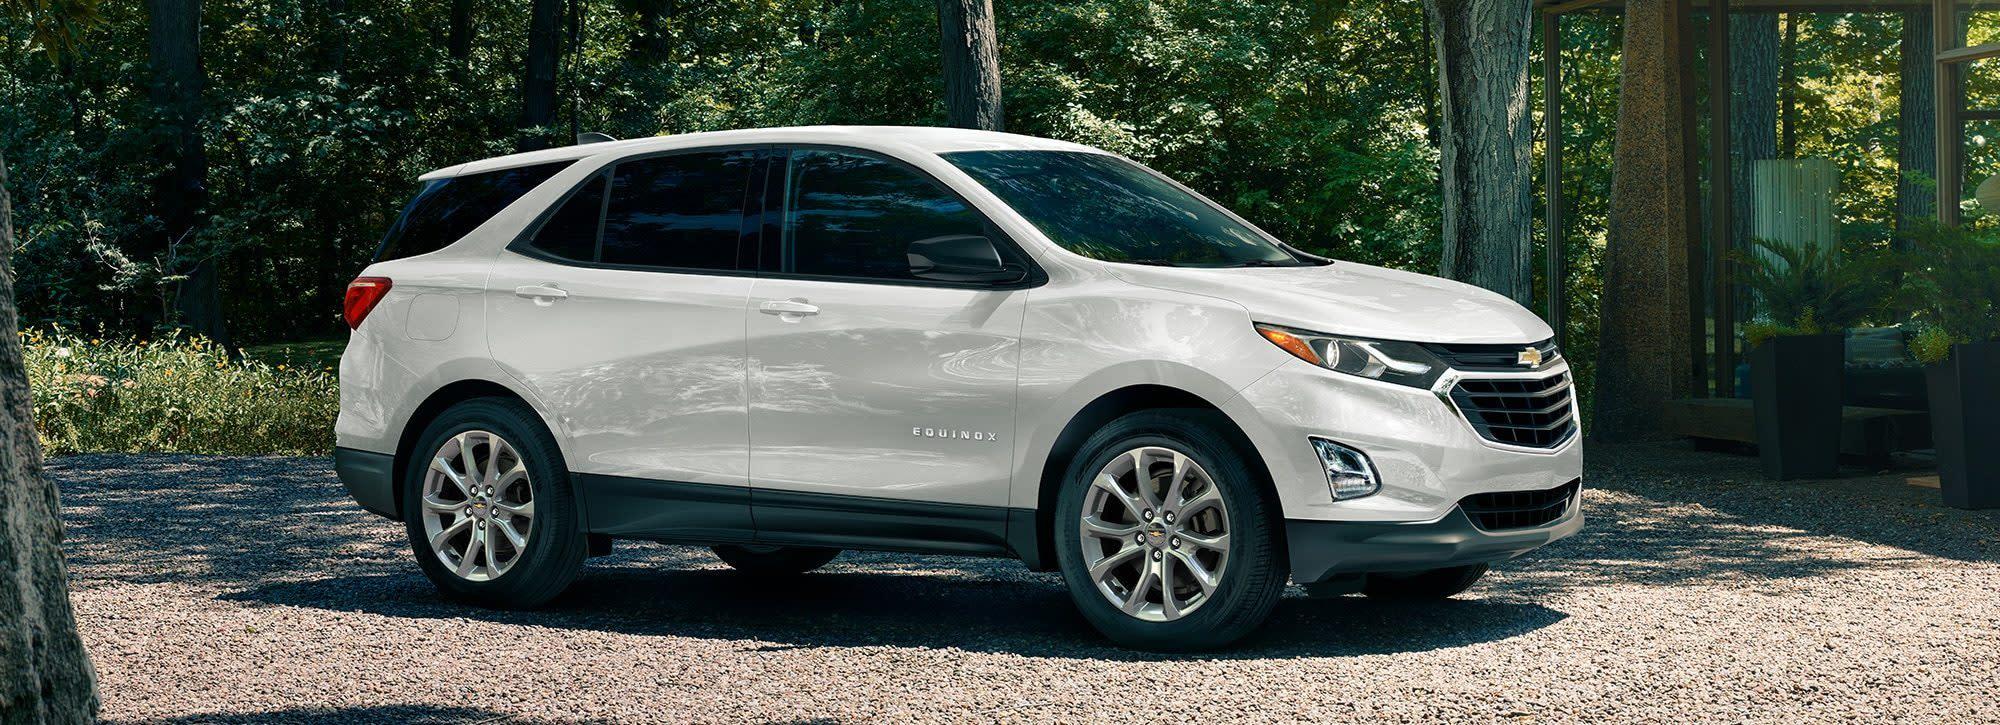 2020 Chevrolet Equinox for Sale near Tulsa, OK